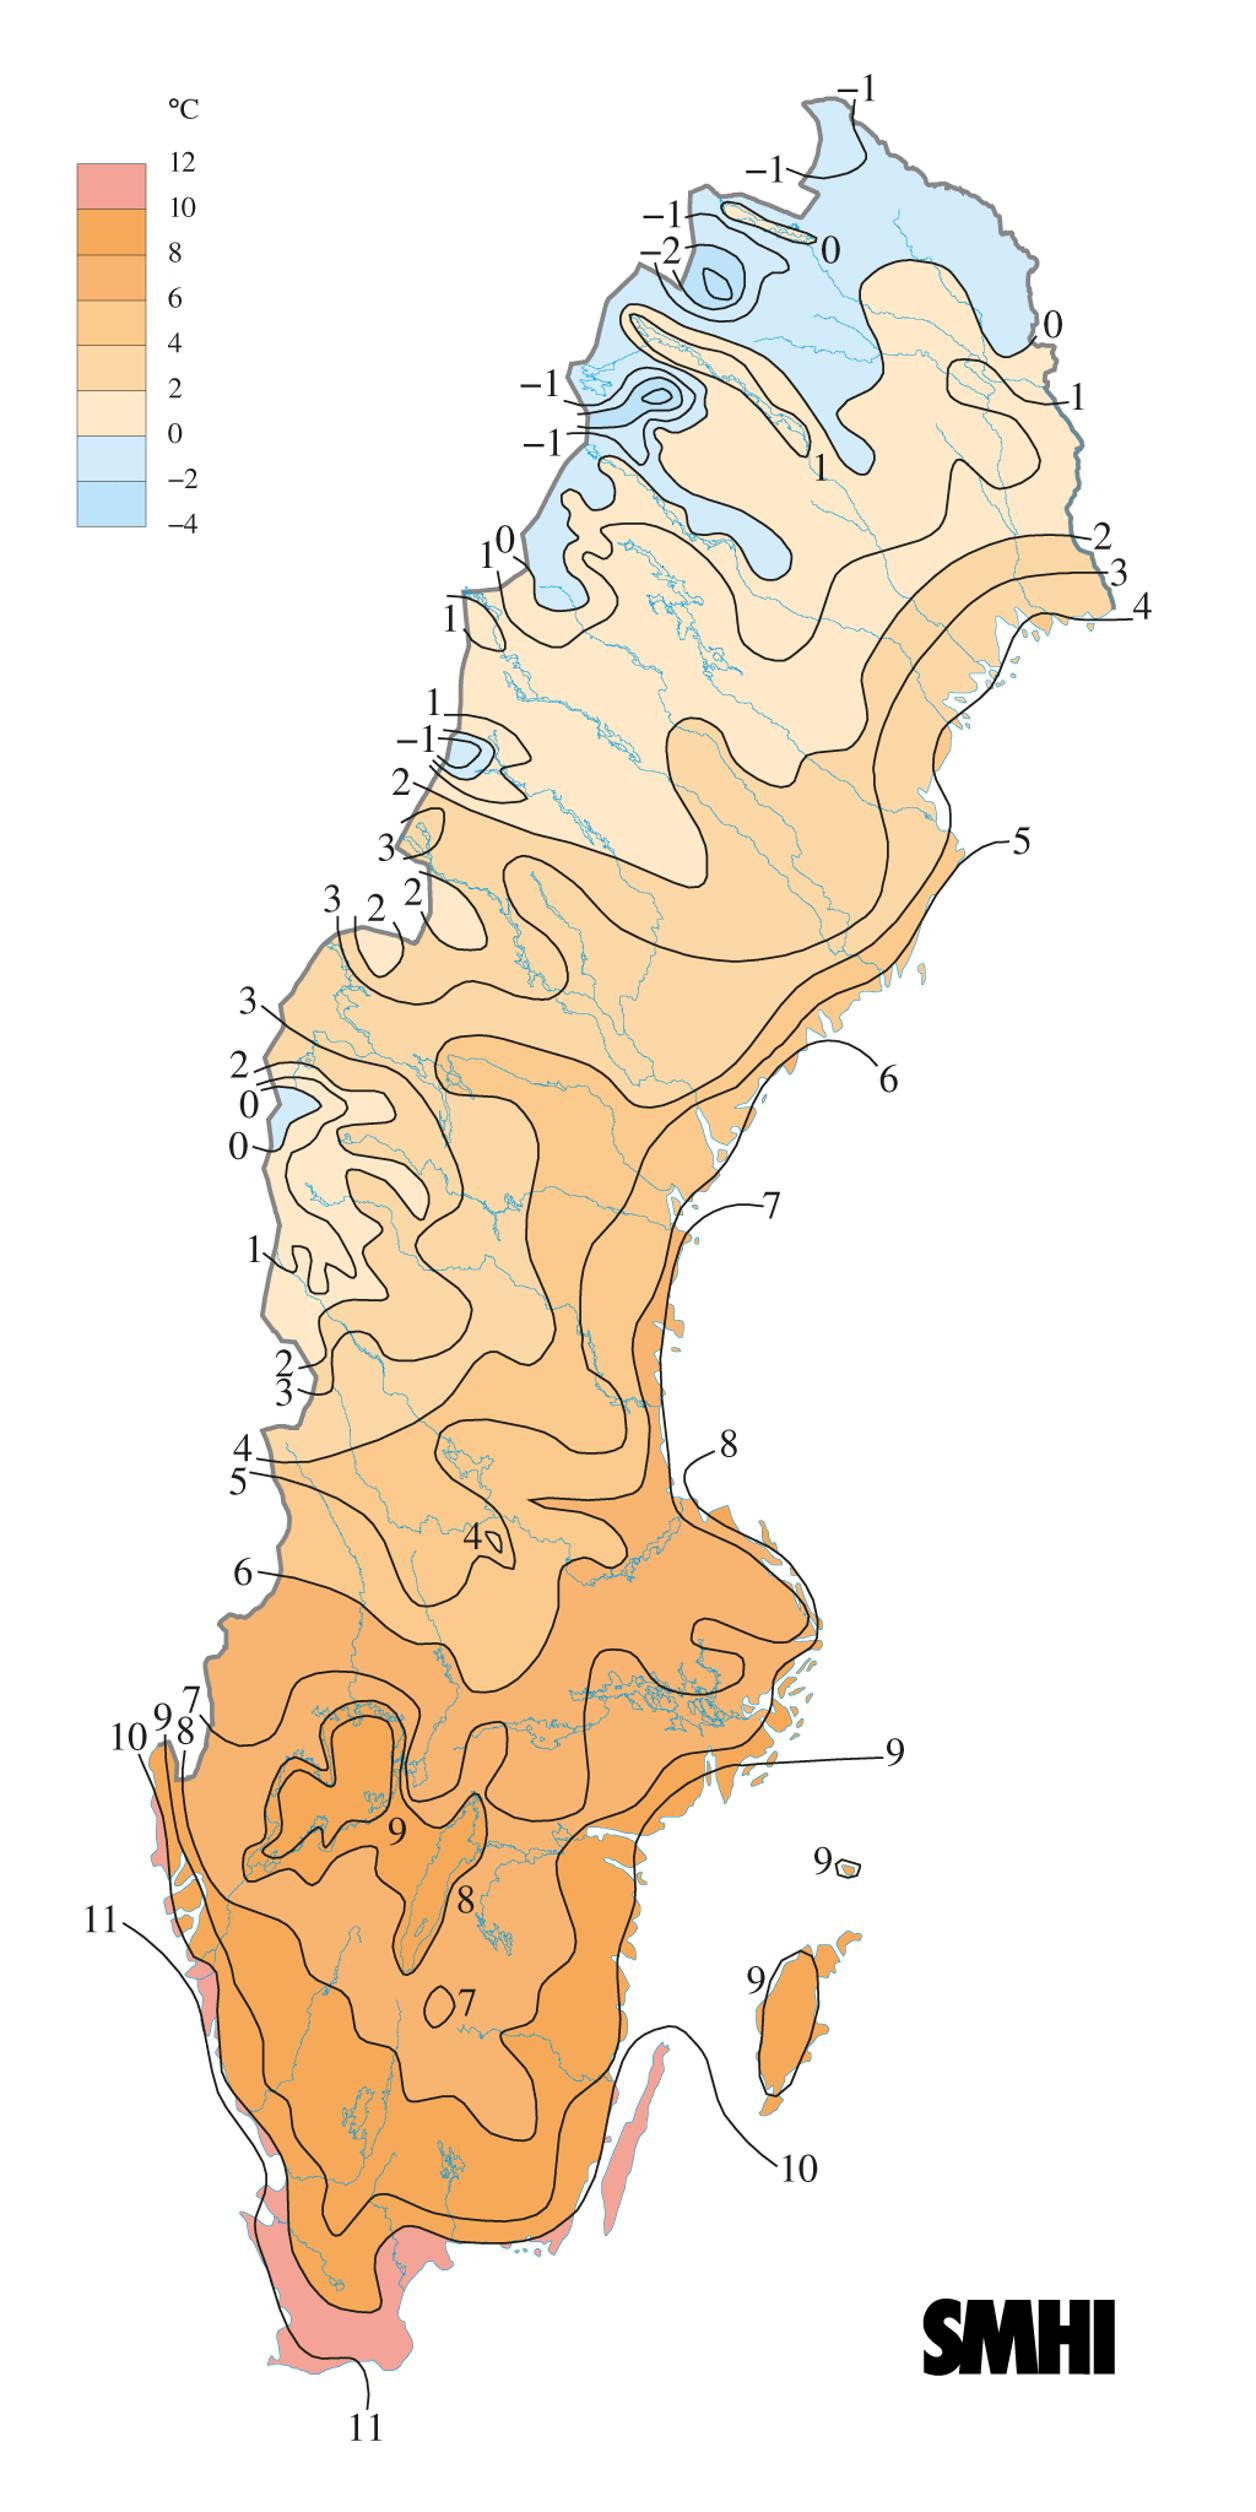 thai södertälje svealand karta